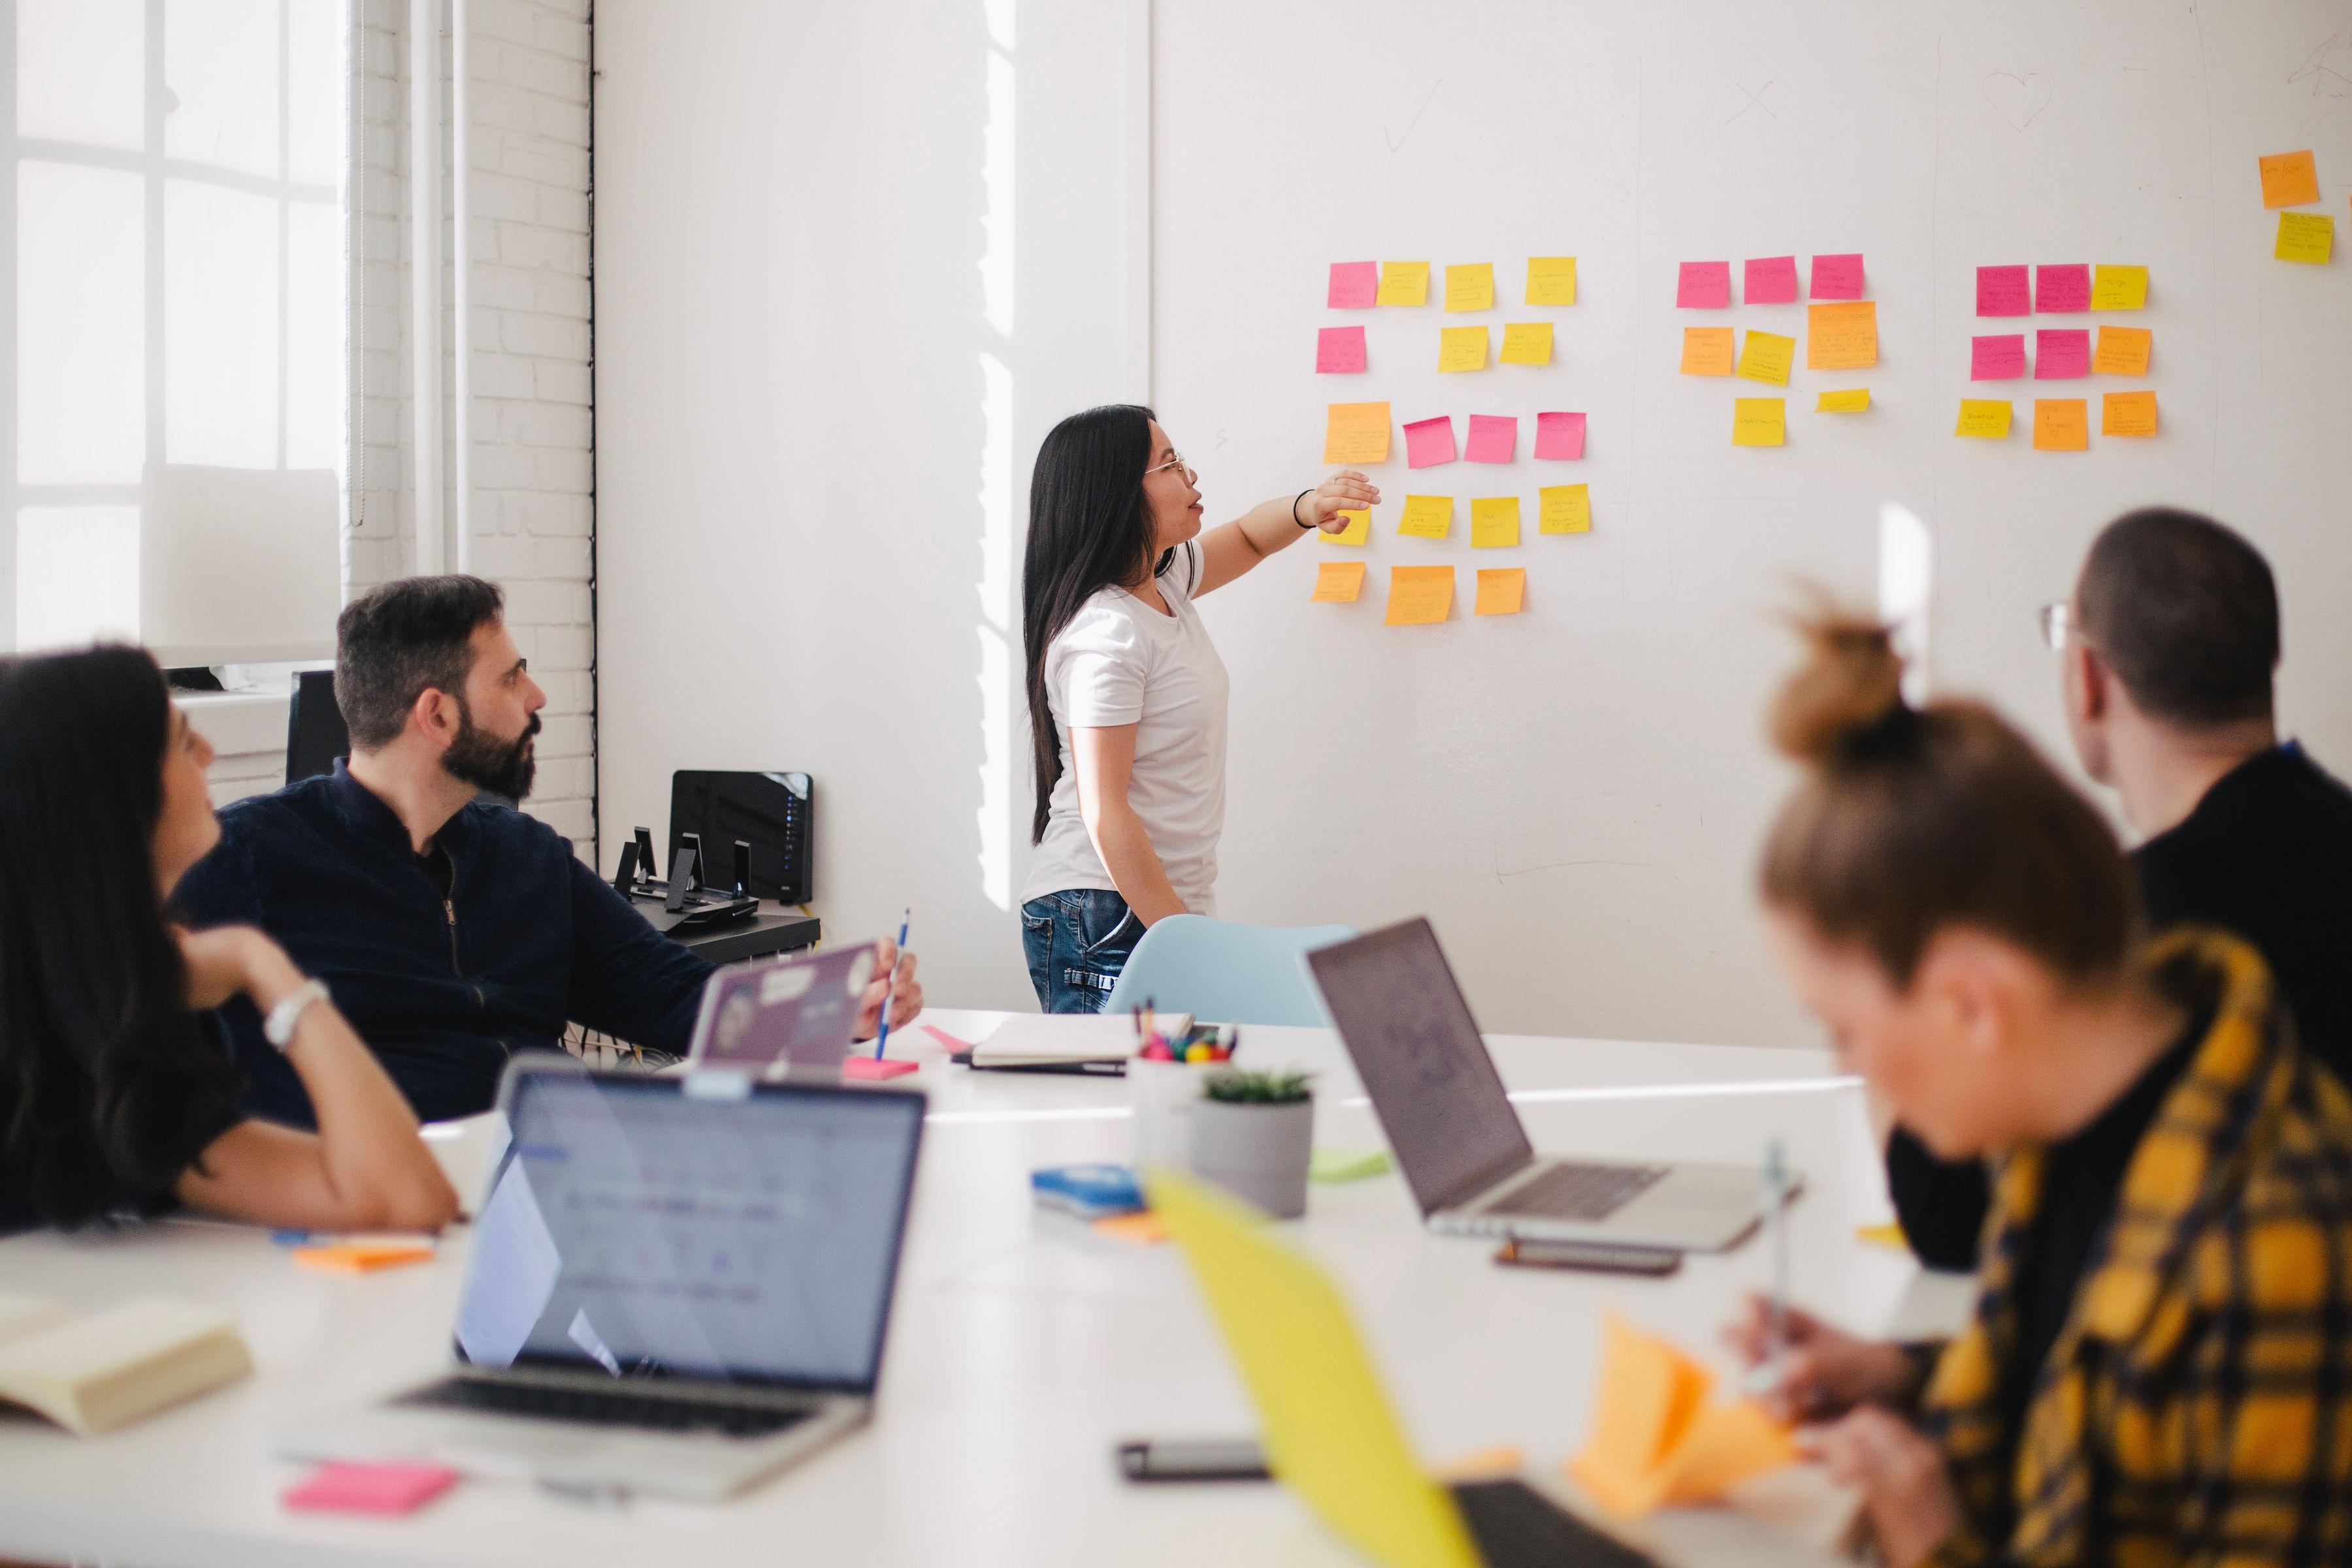 le storytelling startup technologique